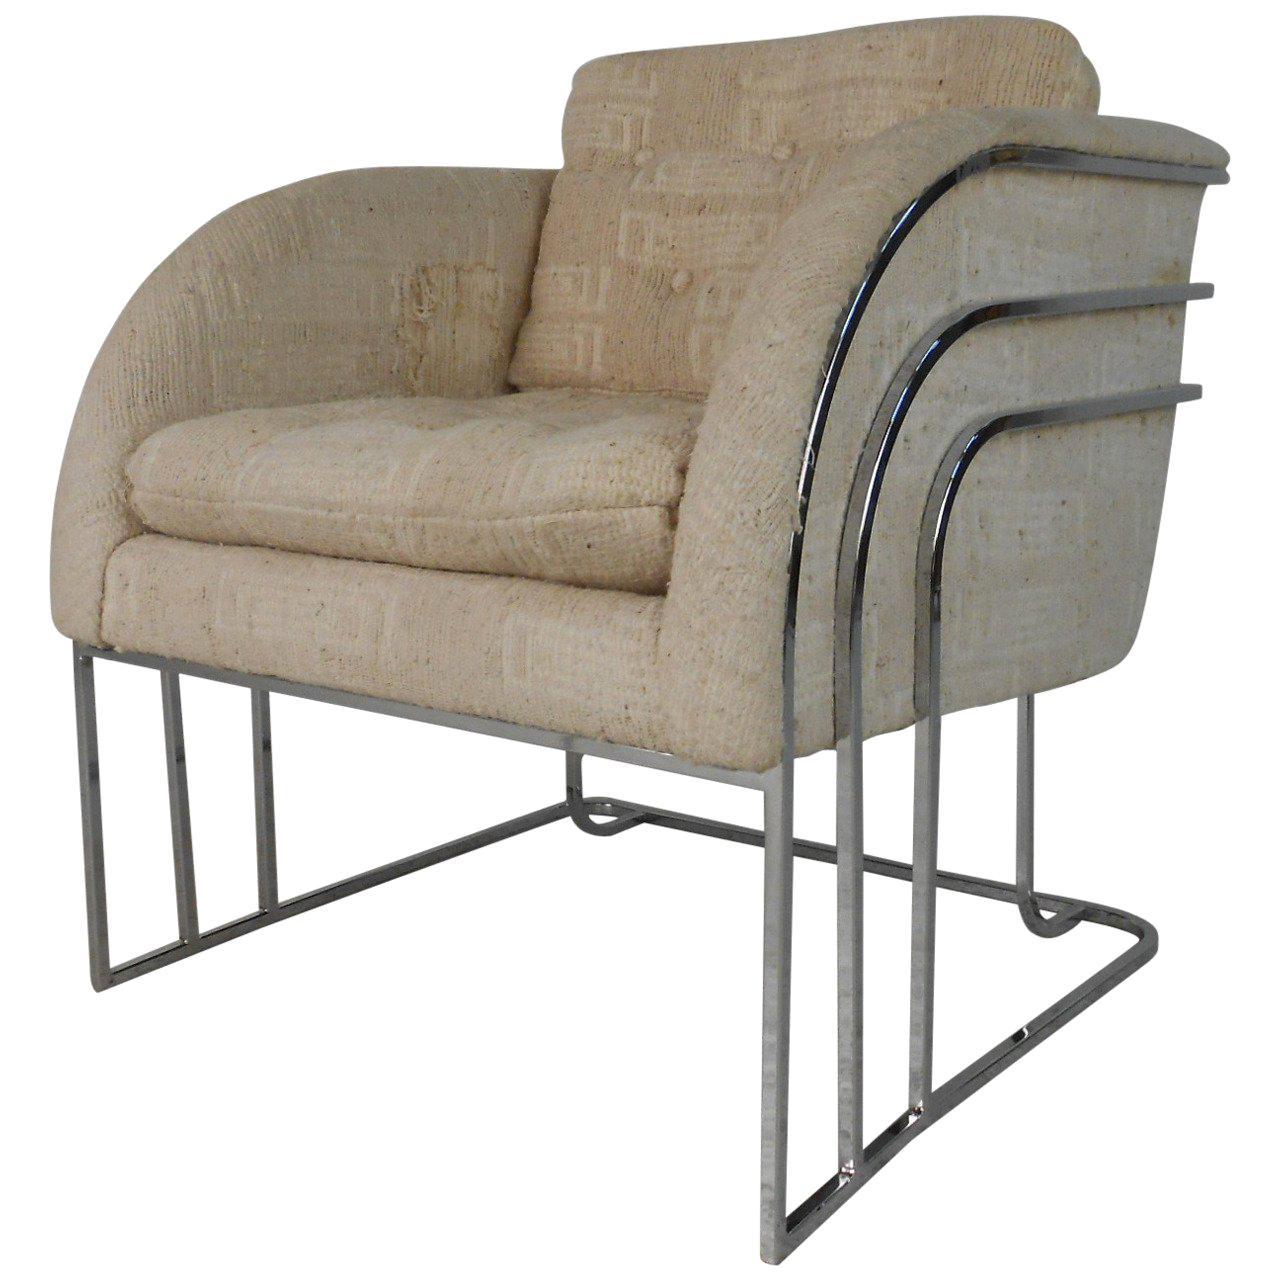 George Mergenov for Weiman/Warren Lloyd Chrome Lounge Chair